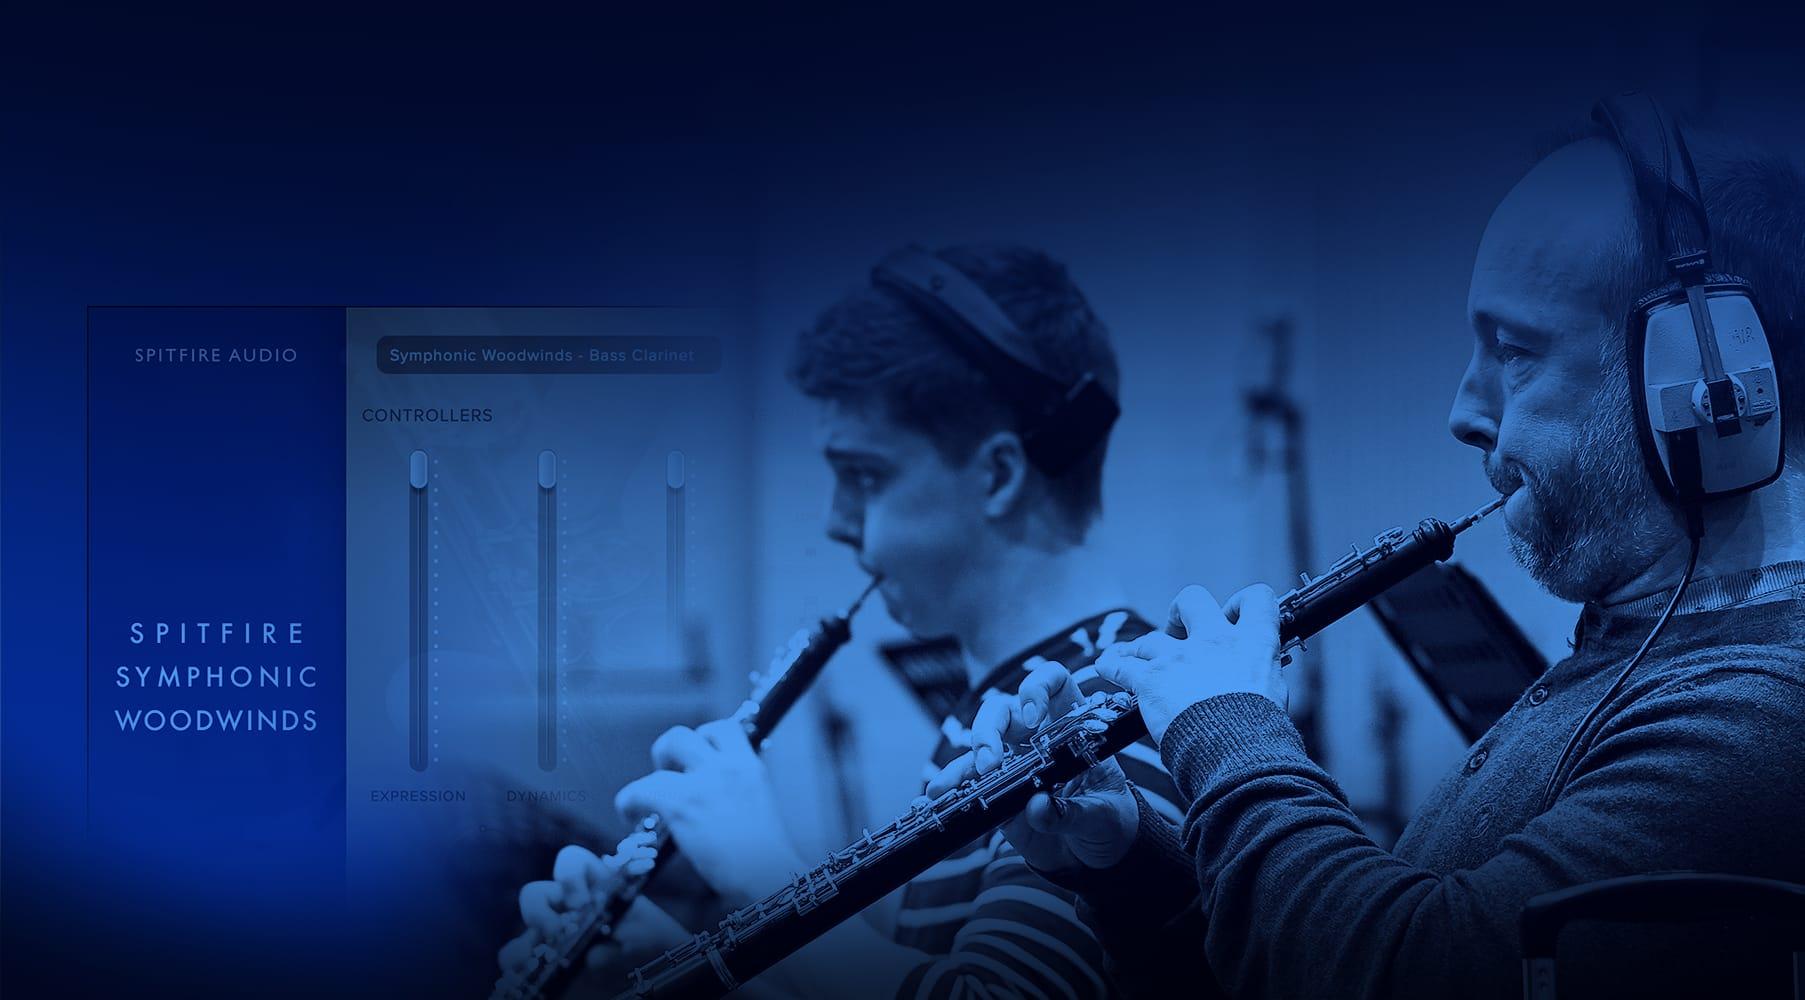 Spitfire Symphonic Woodwinds Collection